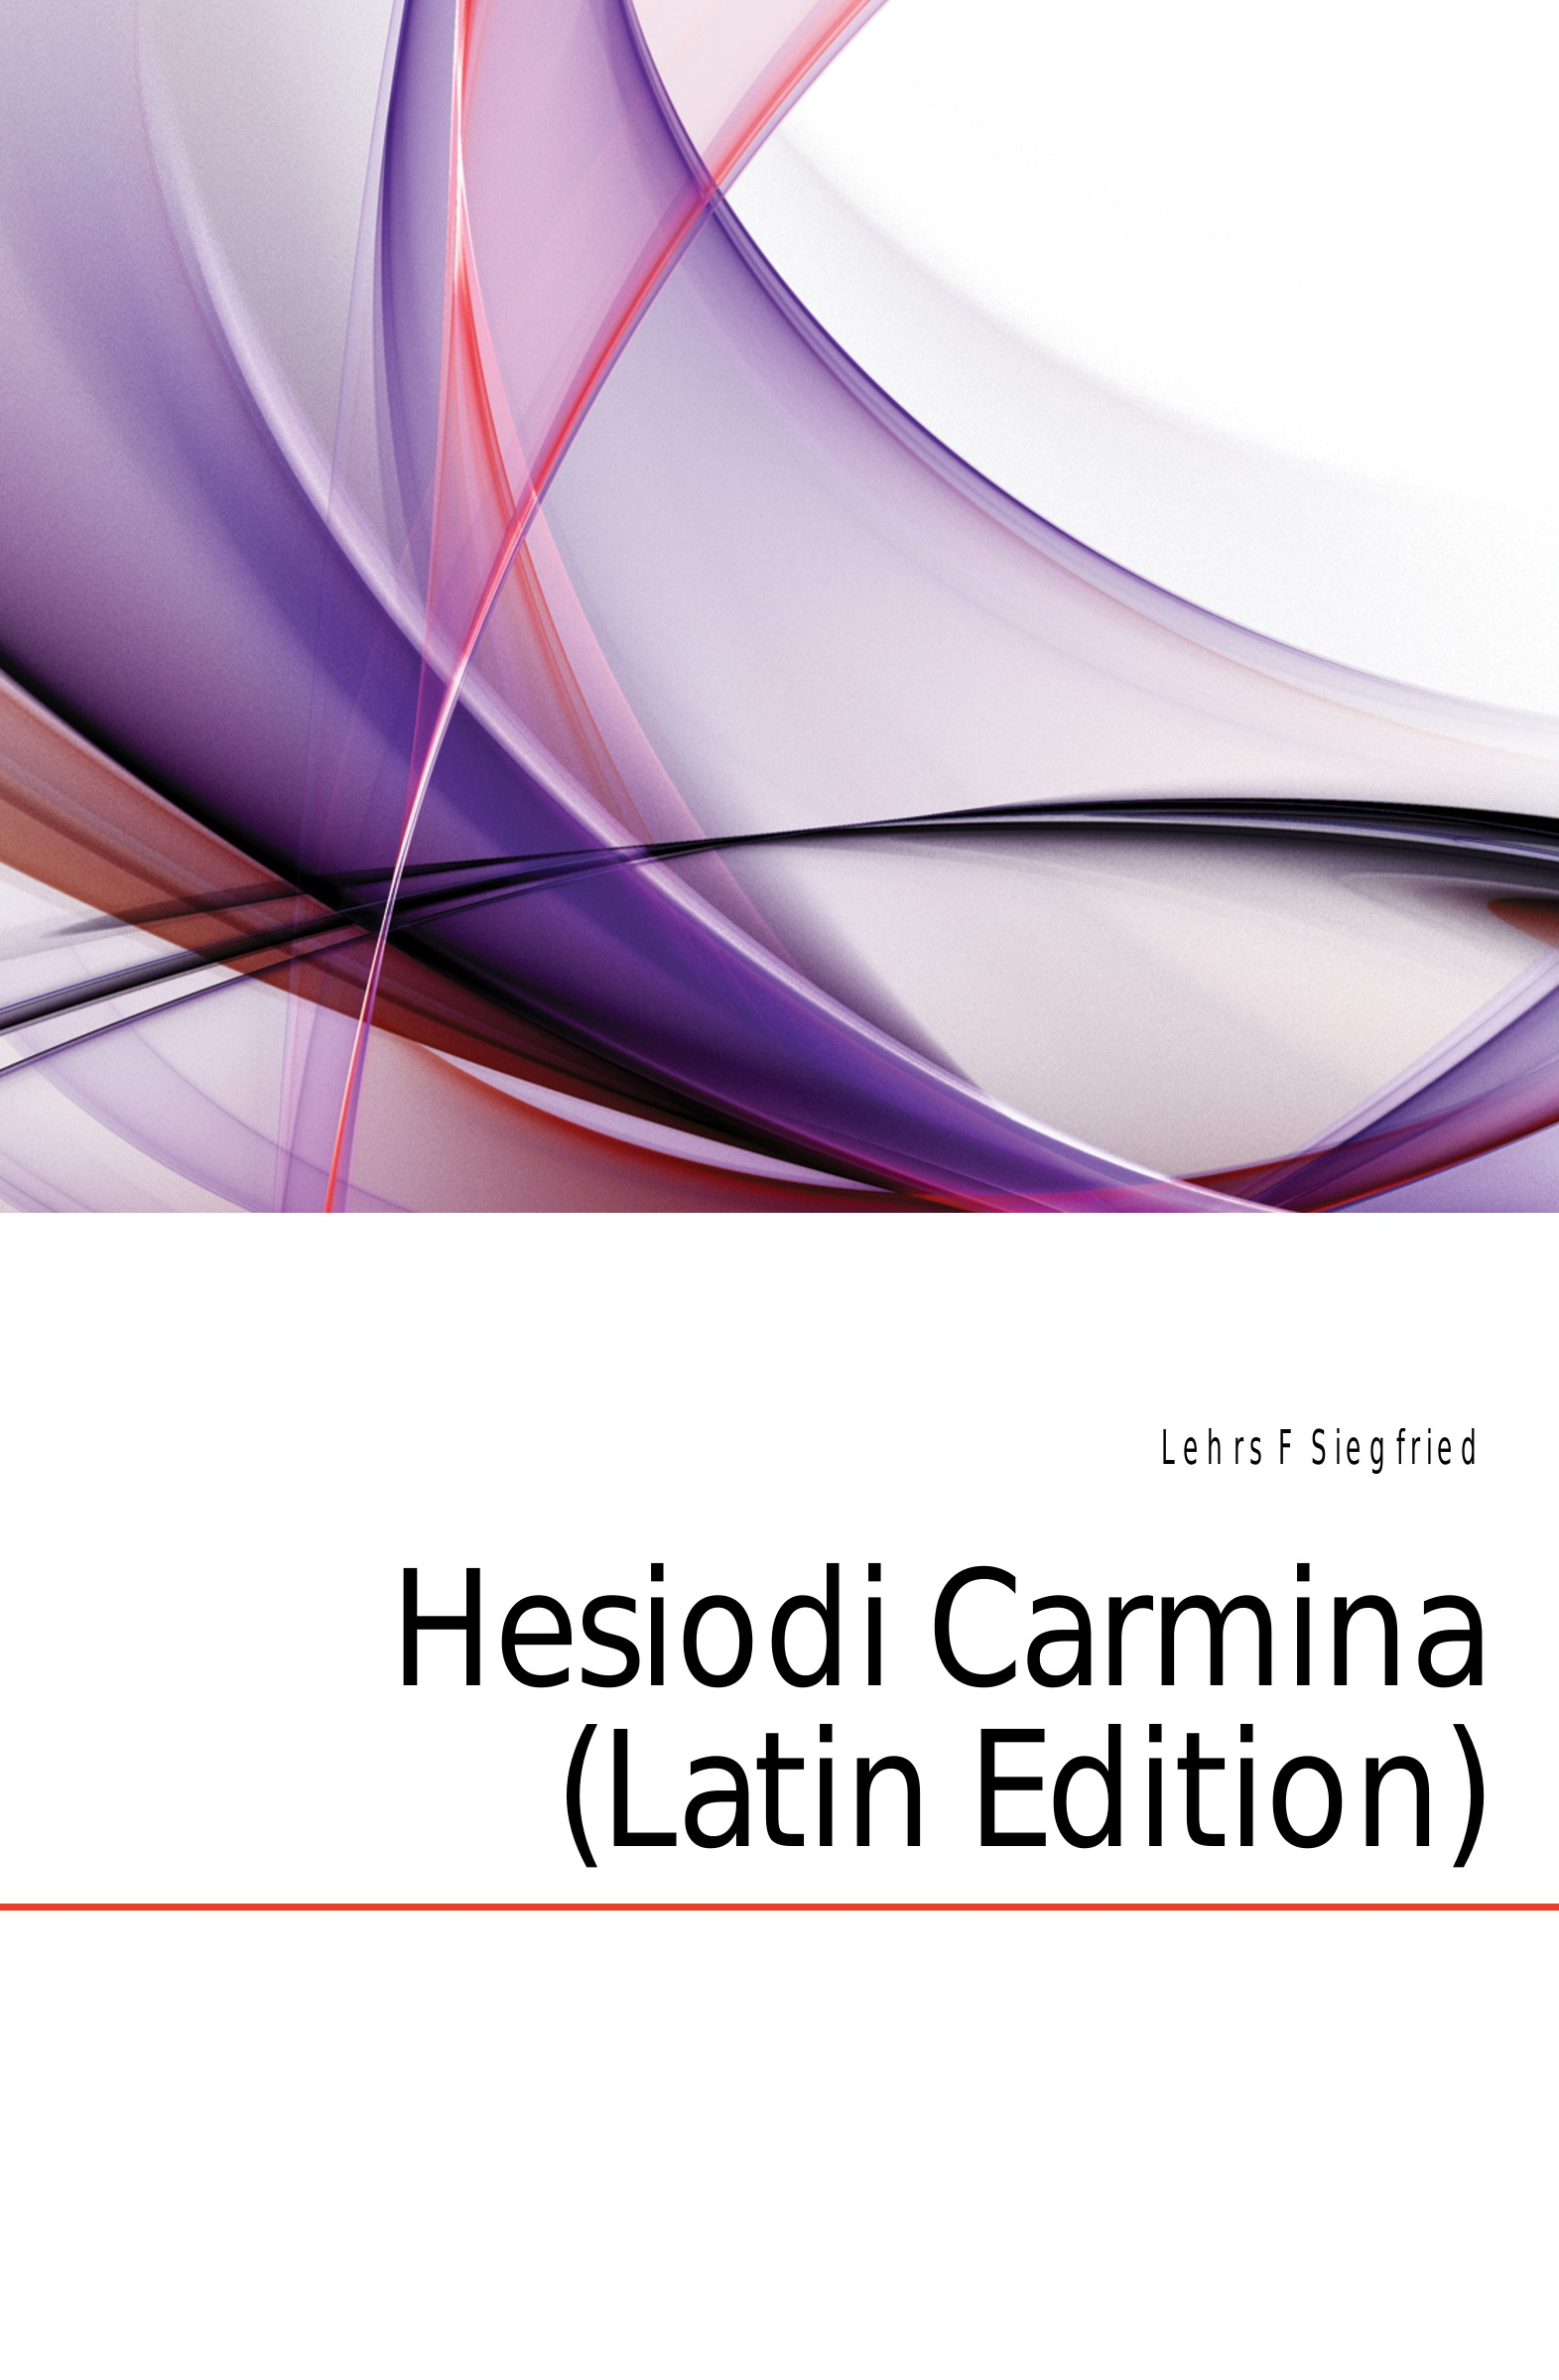 Lehrs F. Siegfried Hesiodi Carmina (Latin Edition) лев толстой anna karenina